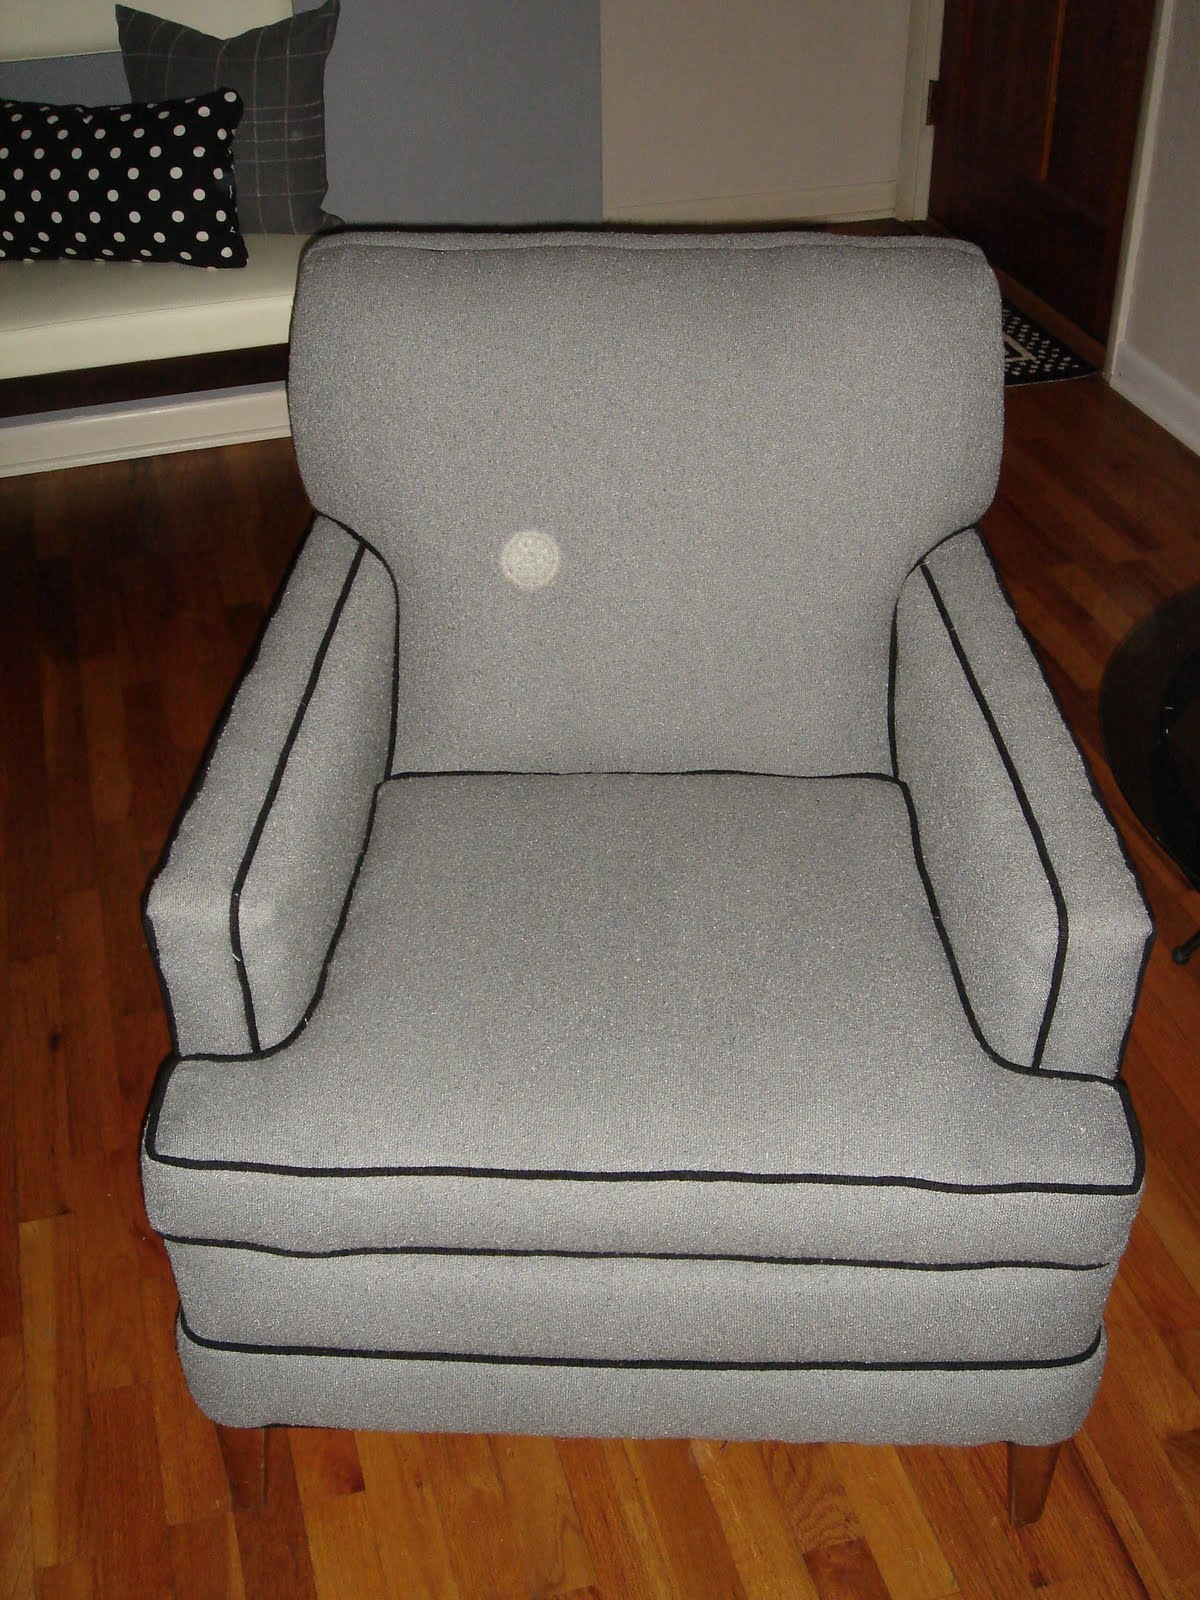 sofa reupholstery cost edinburgh covers sears canada ashley 39s modern ideas